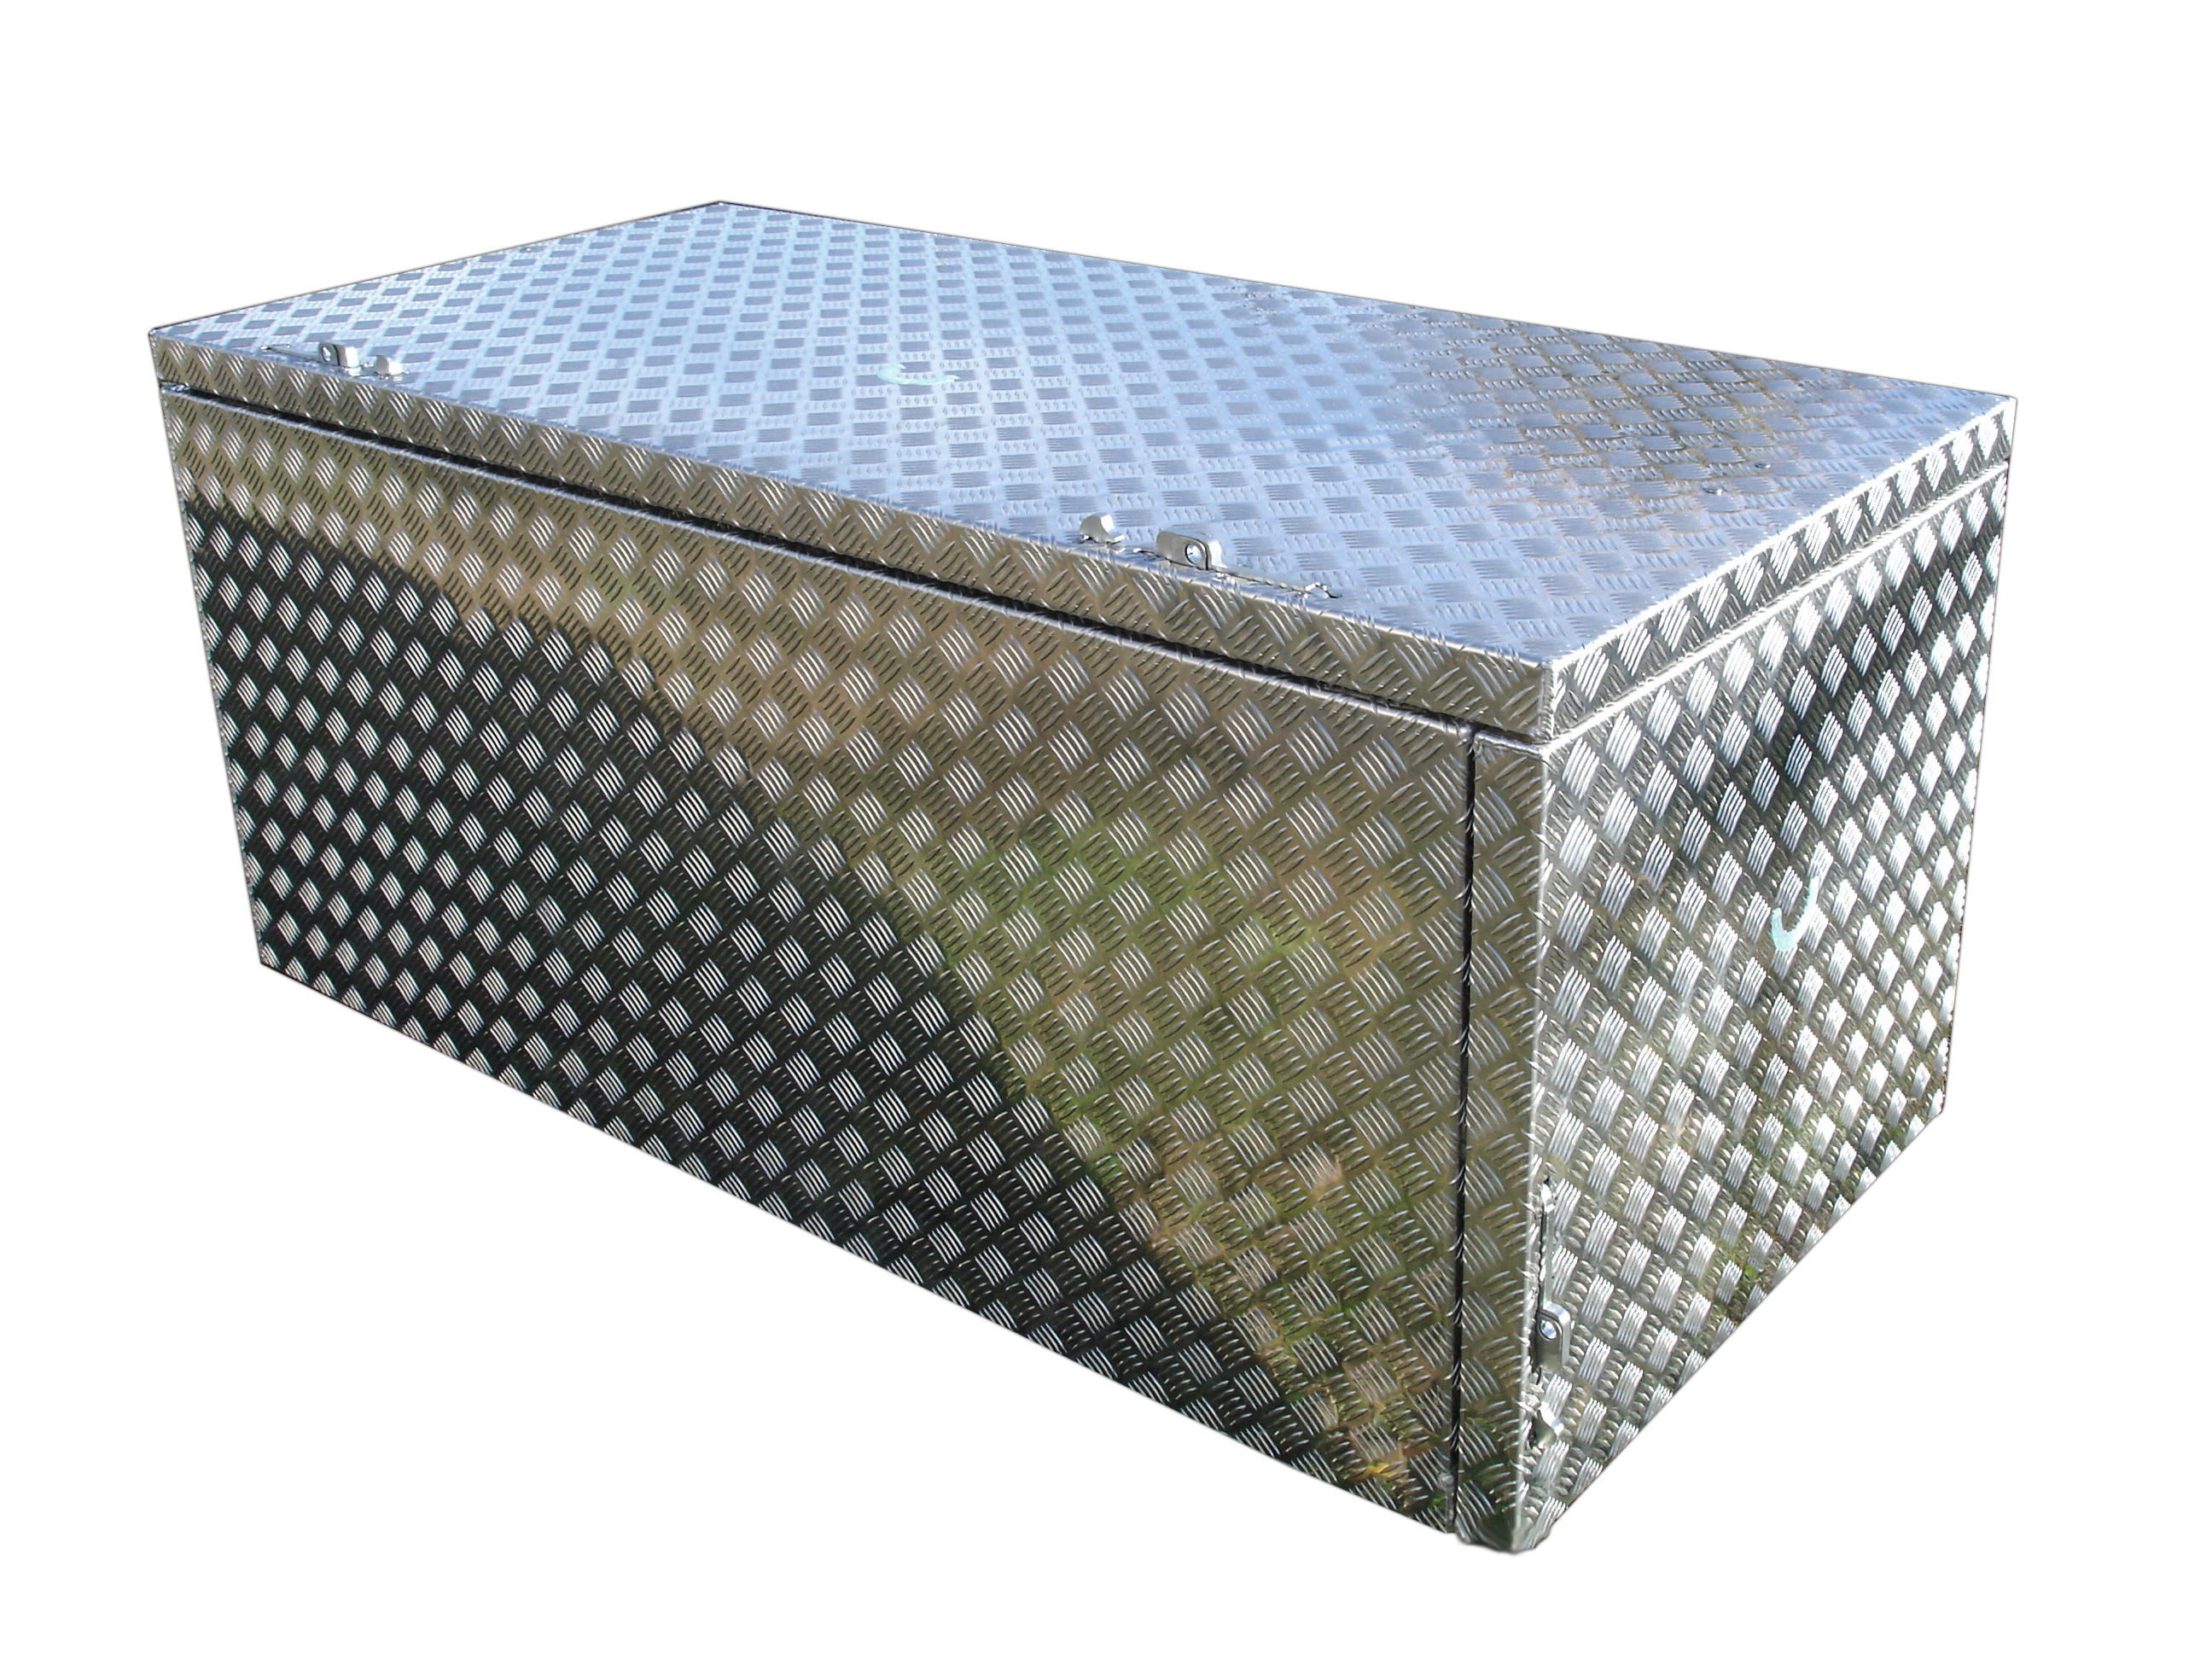 transportkiste aluminium riffelblech. Black Bedroom Furniture Sets. Home Design Ideas